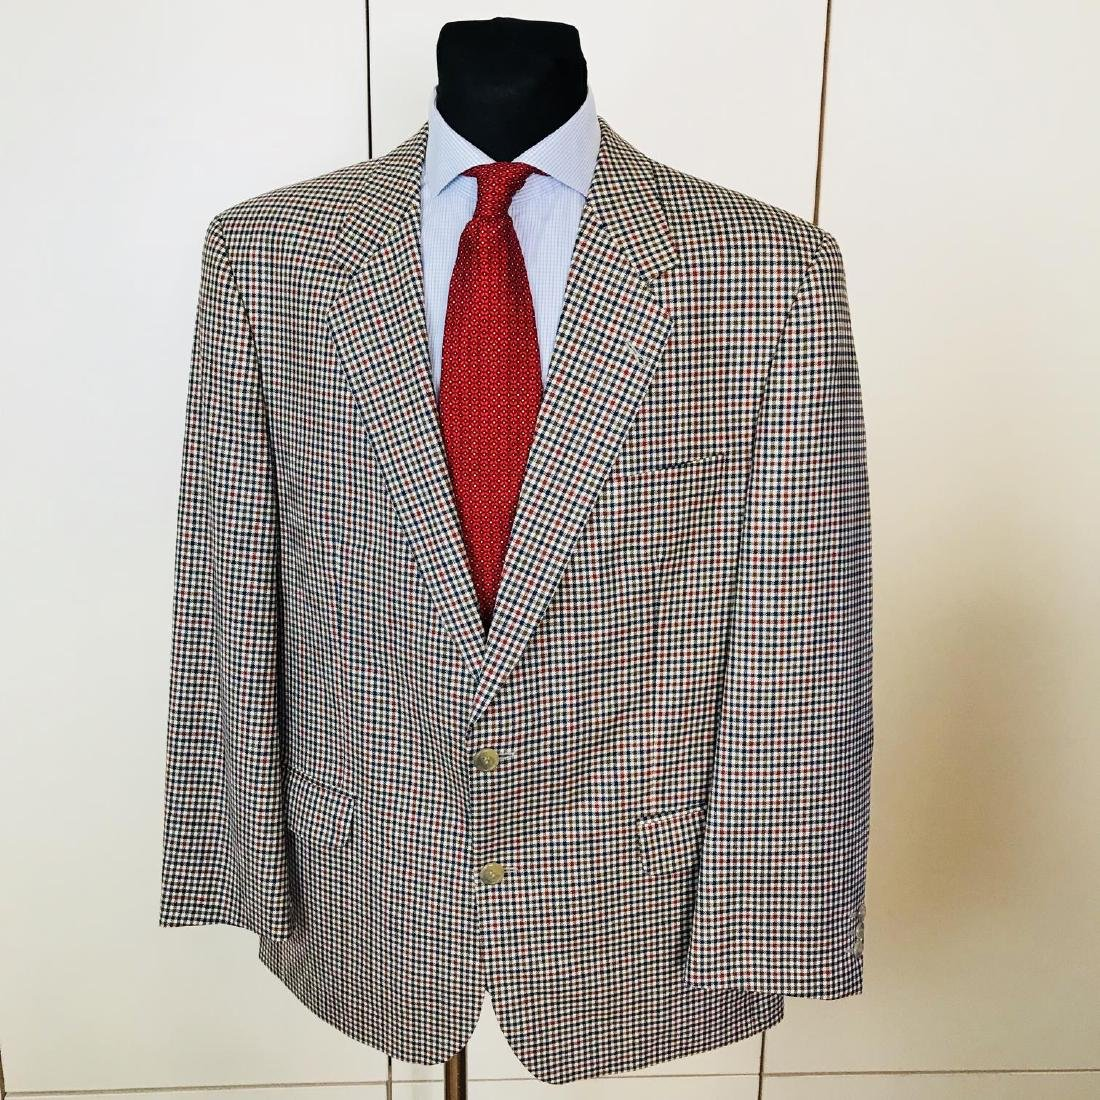 Vintage Men's DESCH Jacket Blazer Size US 46 SHORT